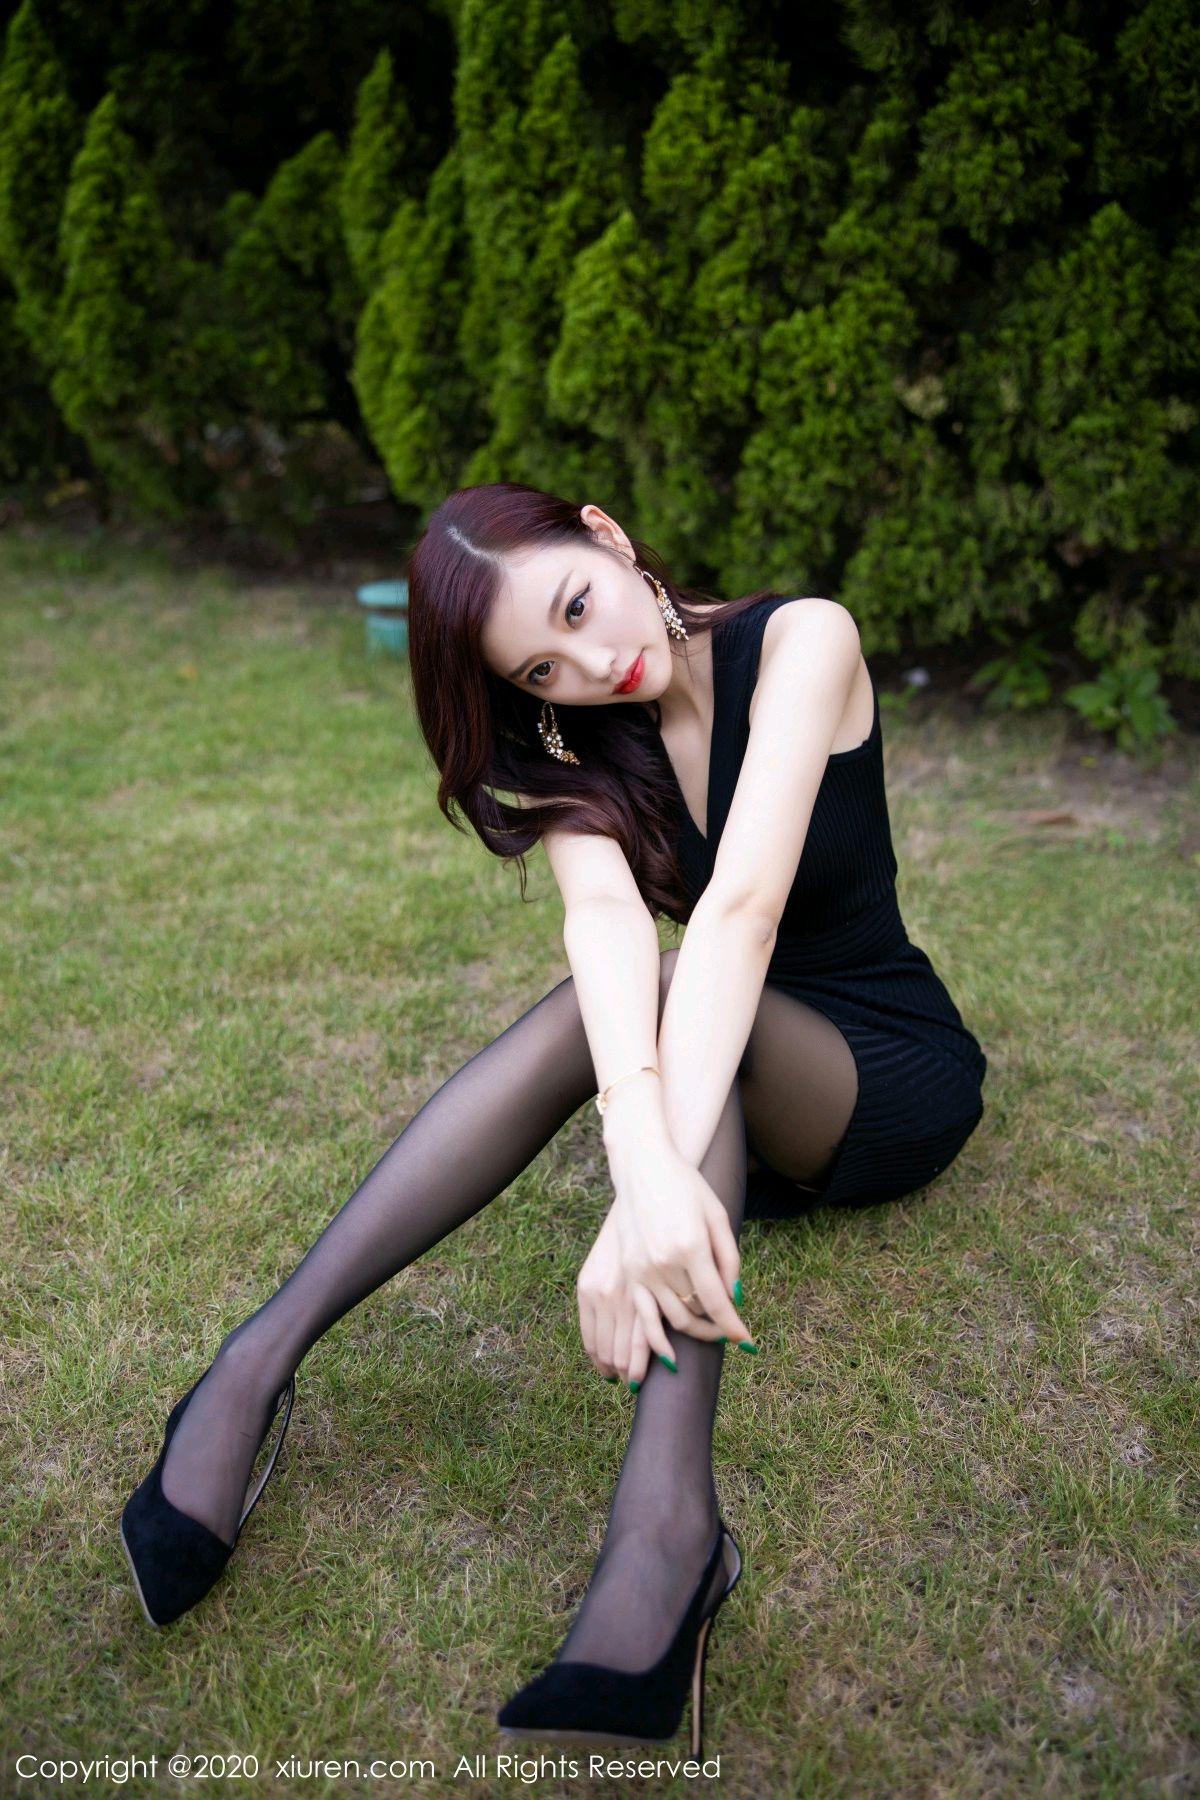 [XiuRen] Vol.2648 Yang Chen Chen 15P, Black Silk, Outdoor, Xiuren, Yang Chen Chen